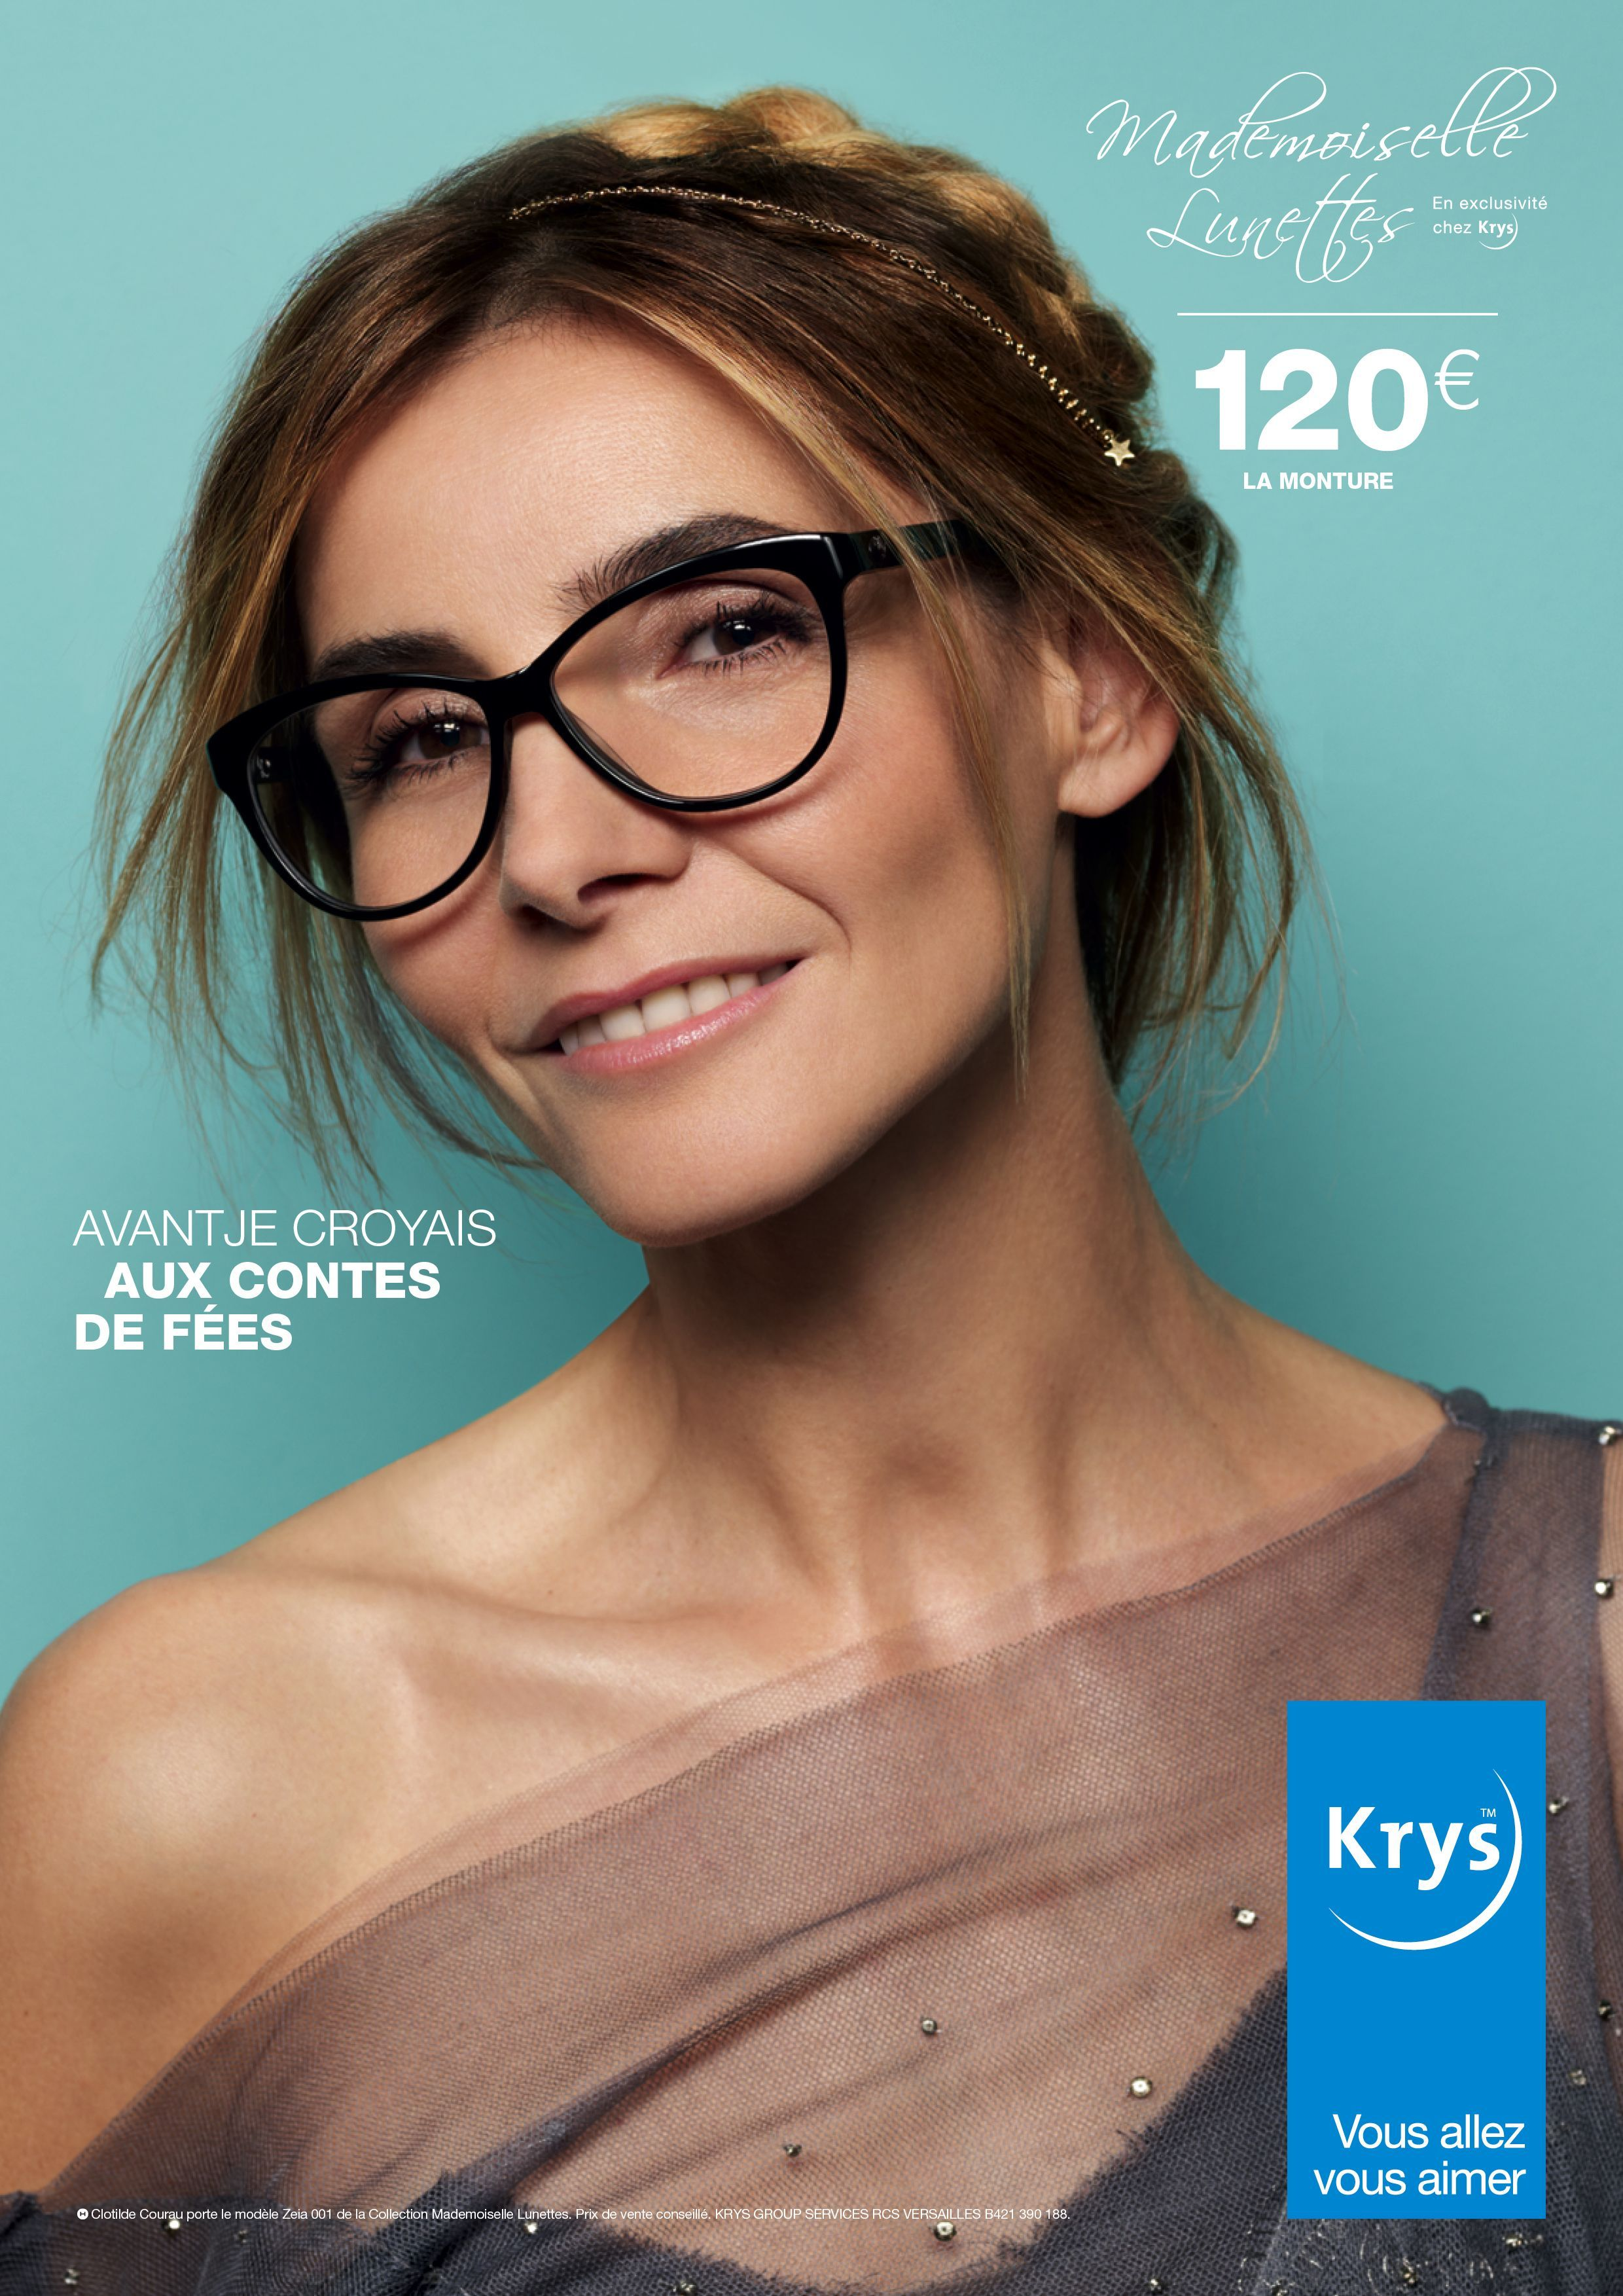 a99f114cd84a31 Clotilde Courau - Krys (2012)   Emmanuele Filiberto   Clotilde ...